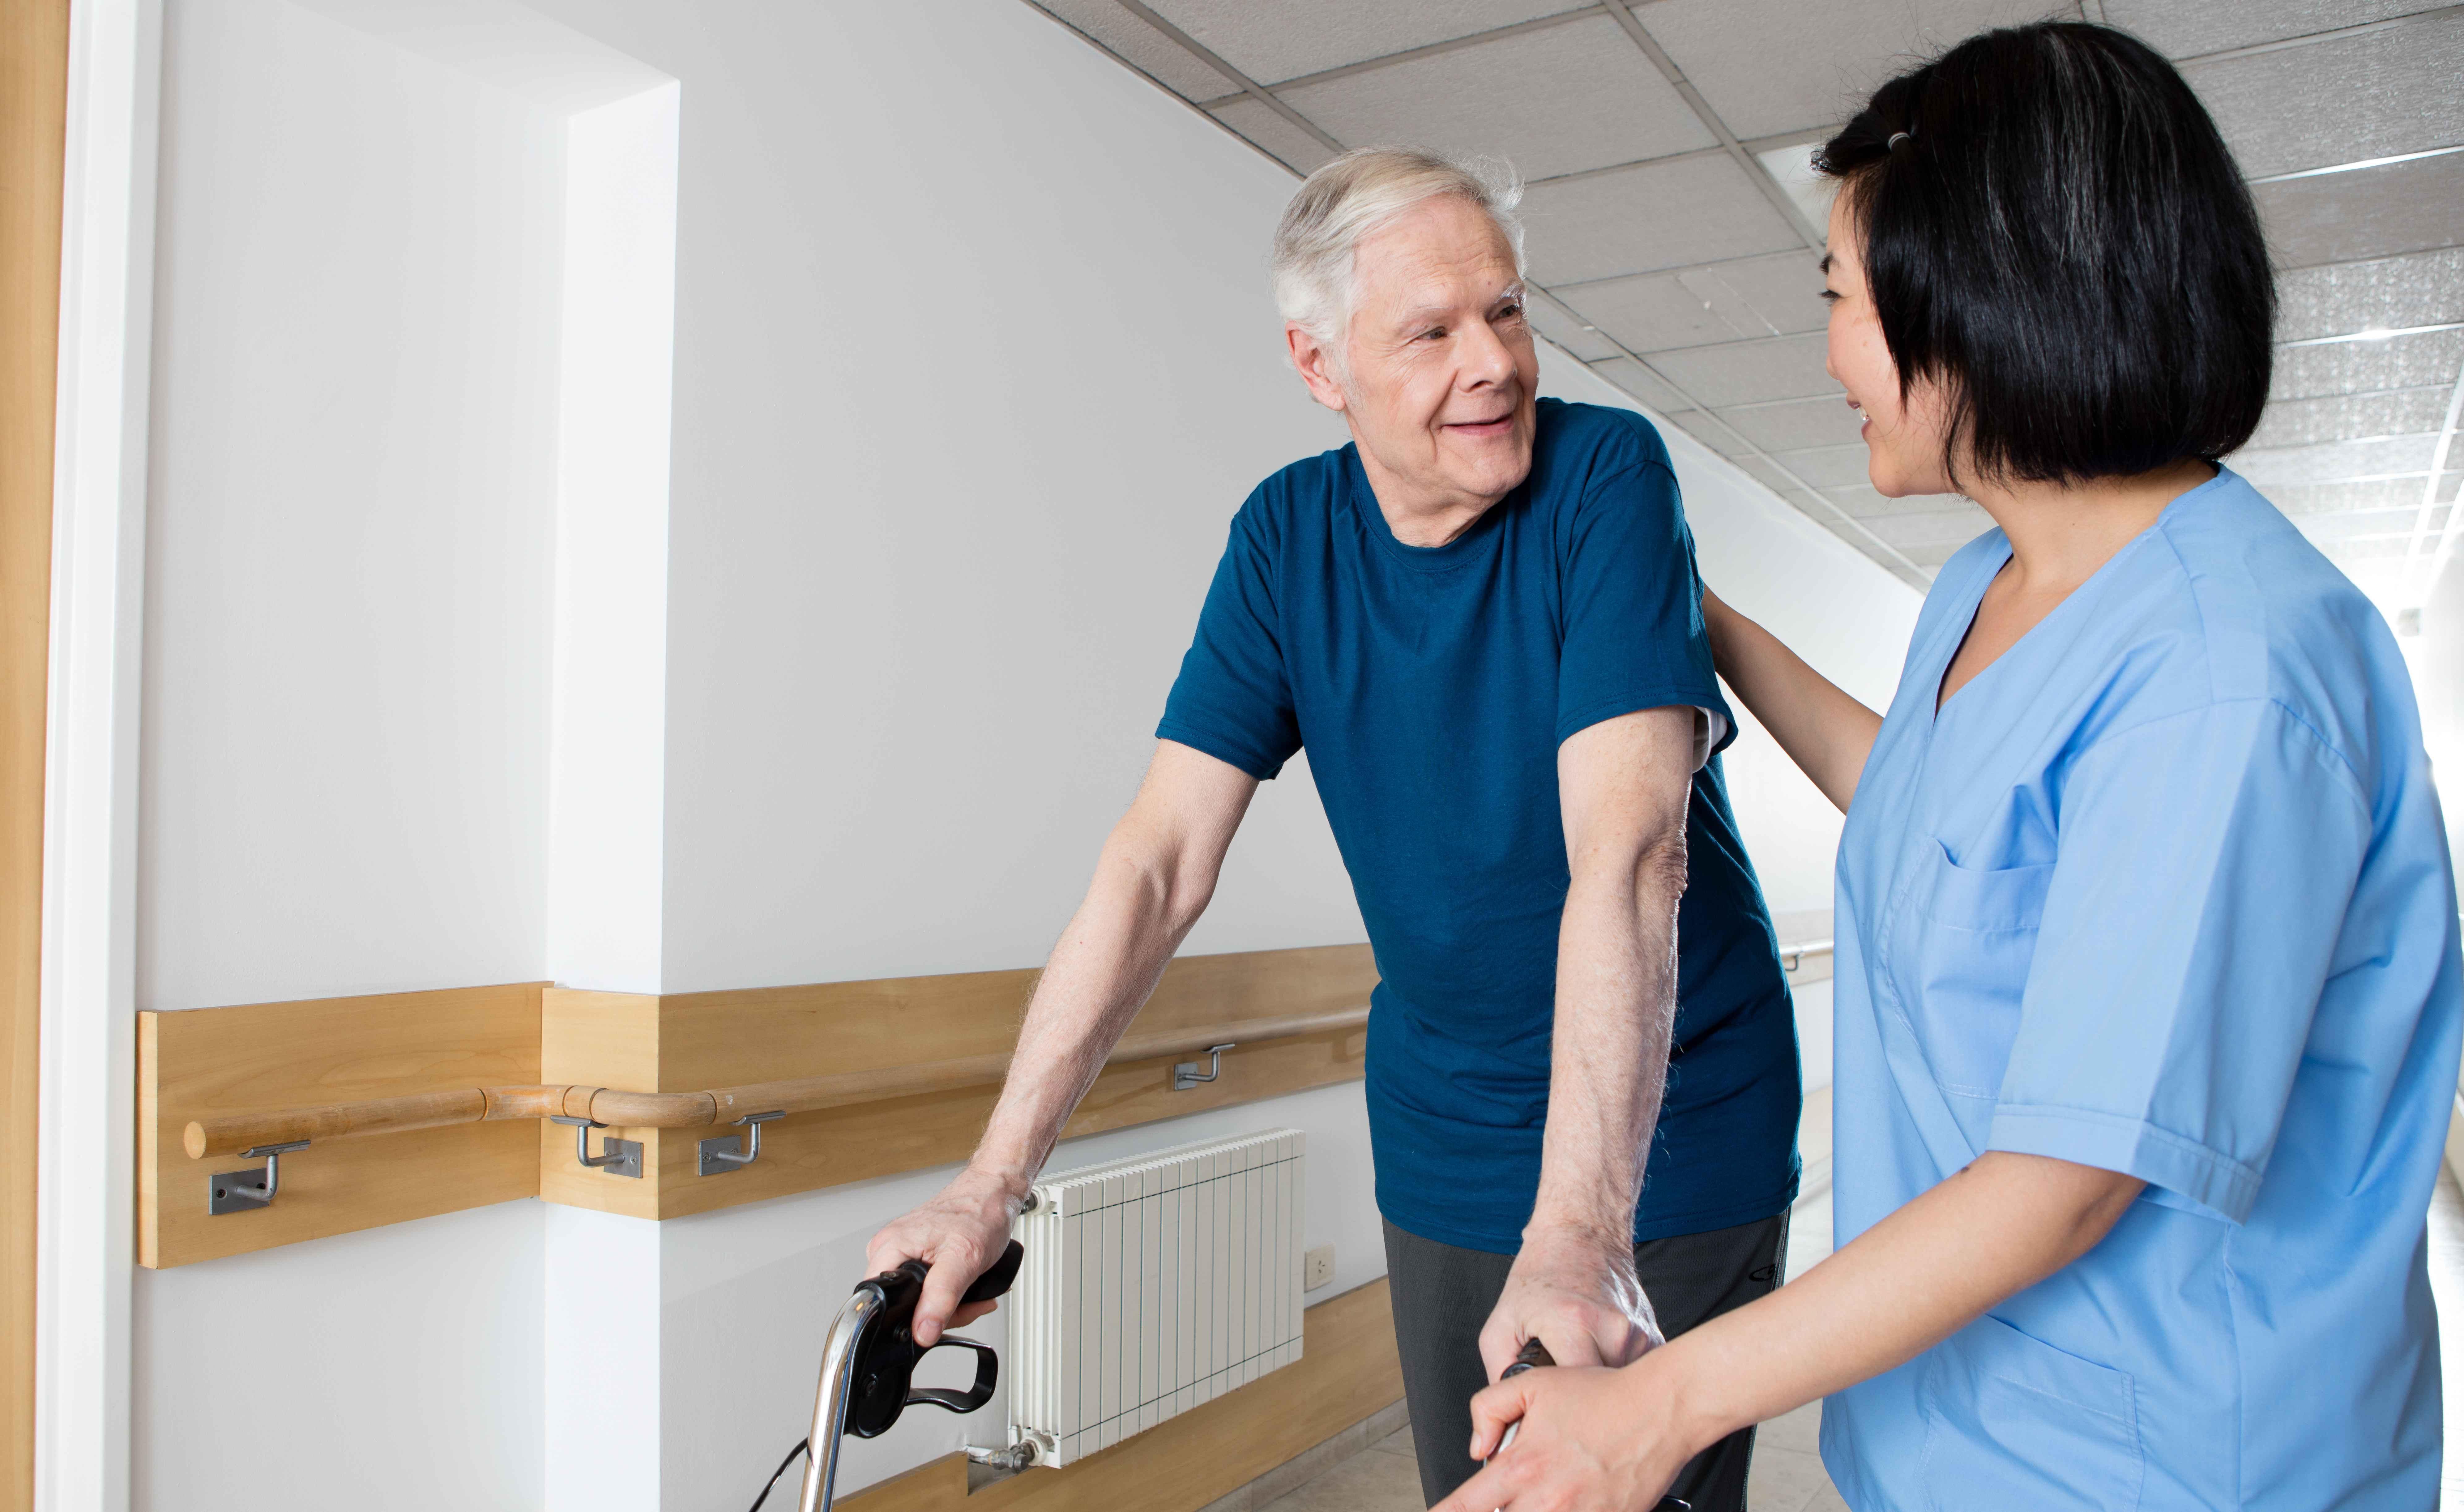 Older man walking through a hallway using a Zimmer frame. Nurse in uniform helping him